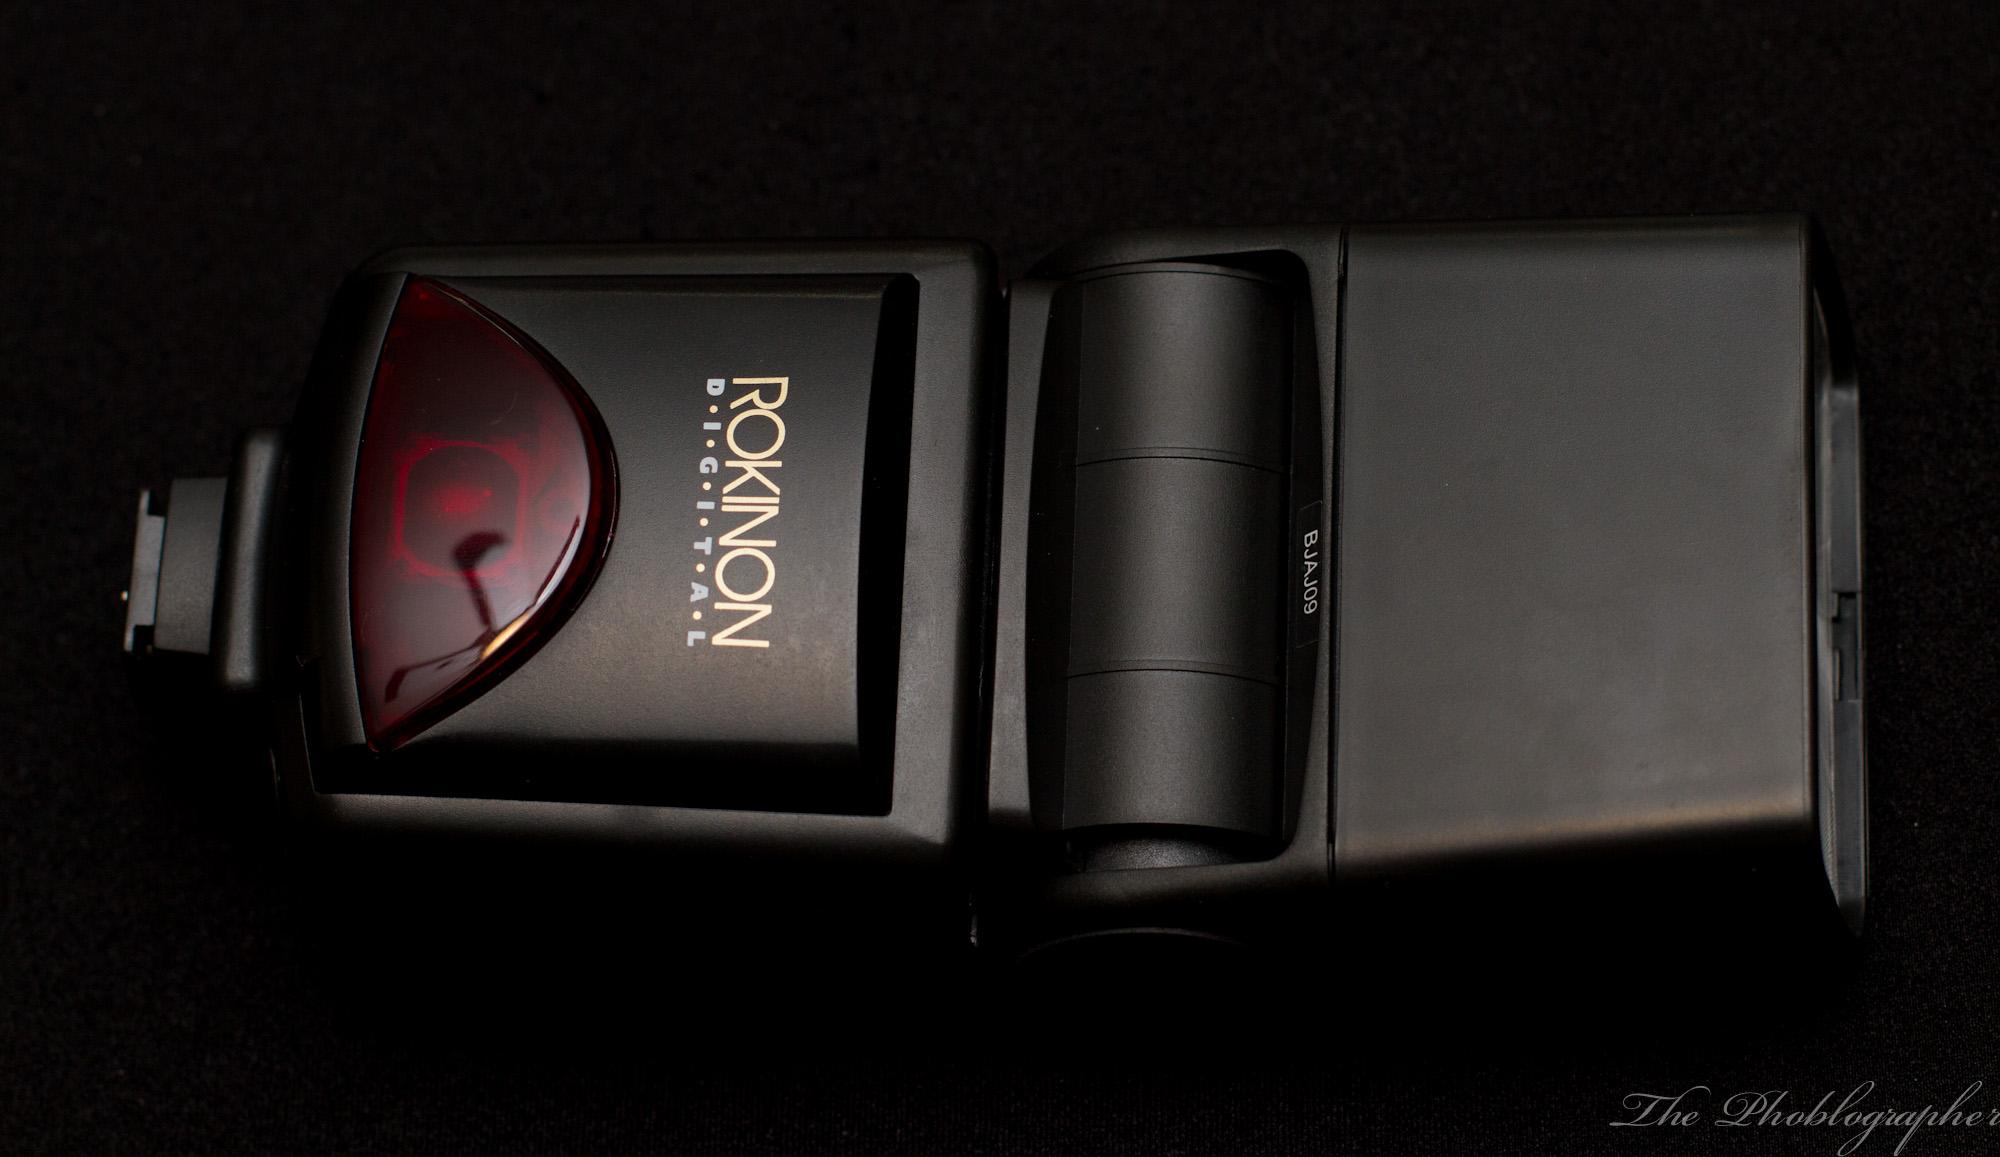 Chris Gampat The Phoblographer rokinon flash product shots (1 of 5)